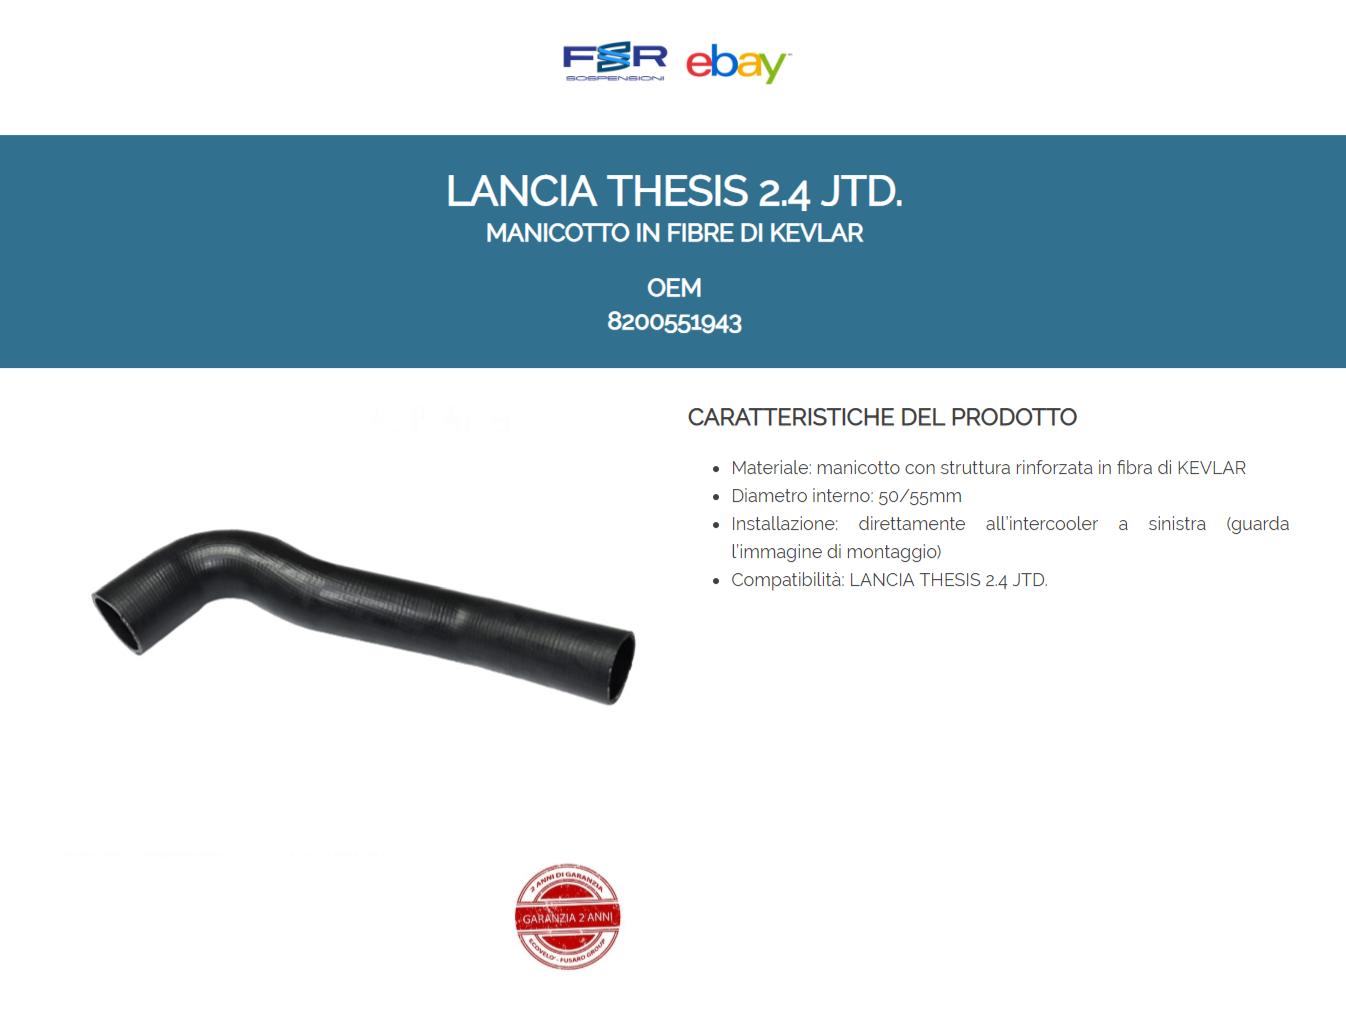 L A N C I A THESIS 2.4 JTD MANICOTTO INTERCOOLER TUBO ARIA 60688697